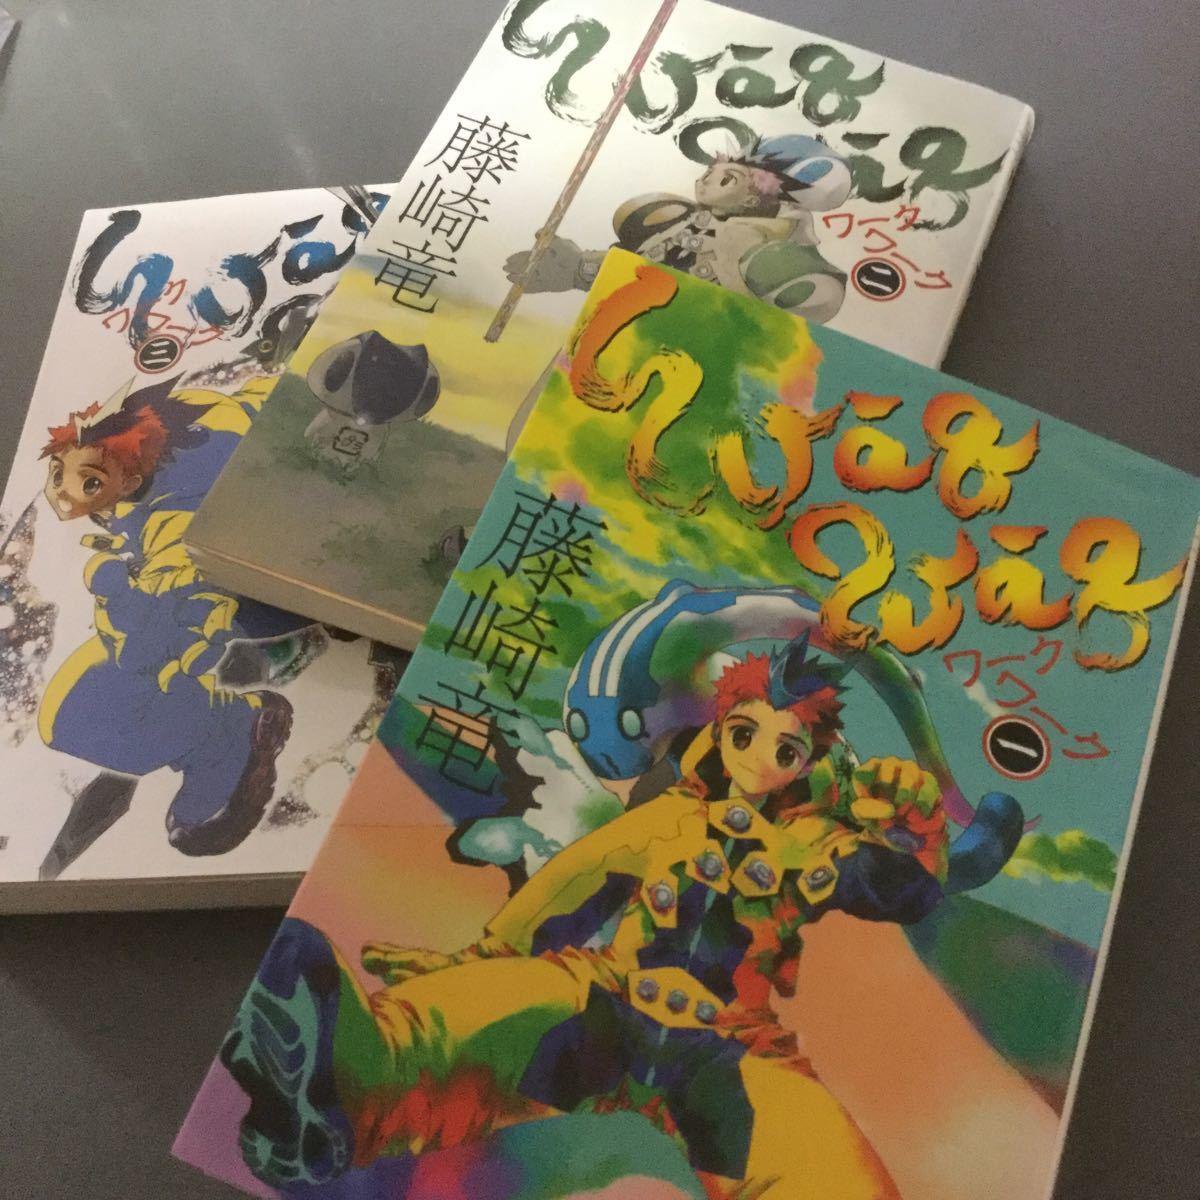 ワークワーク (文庫版) 1〜3集英社C文庫/藤崎竜 (著者)